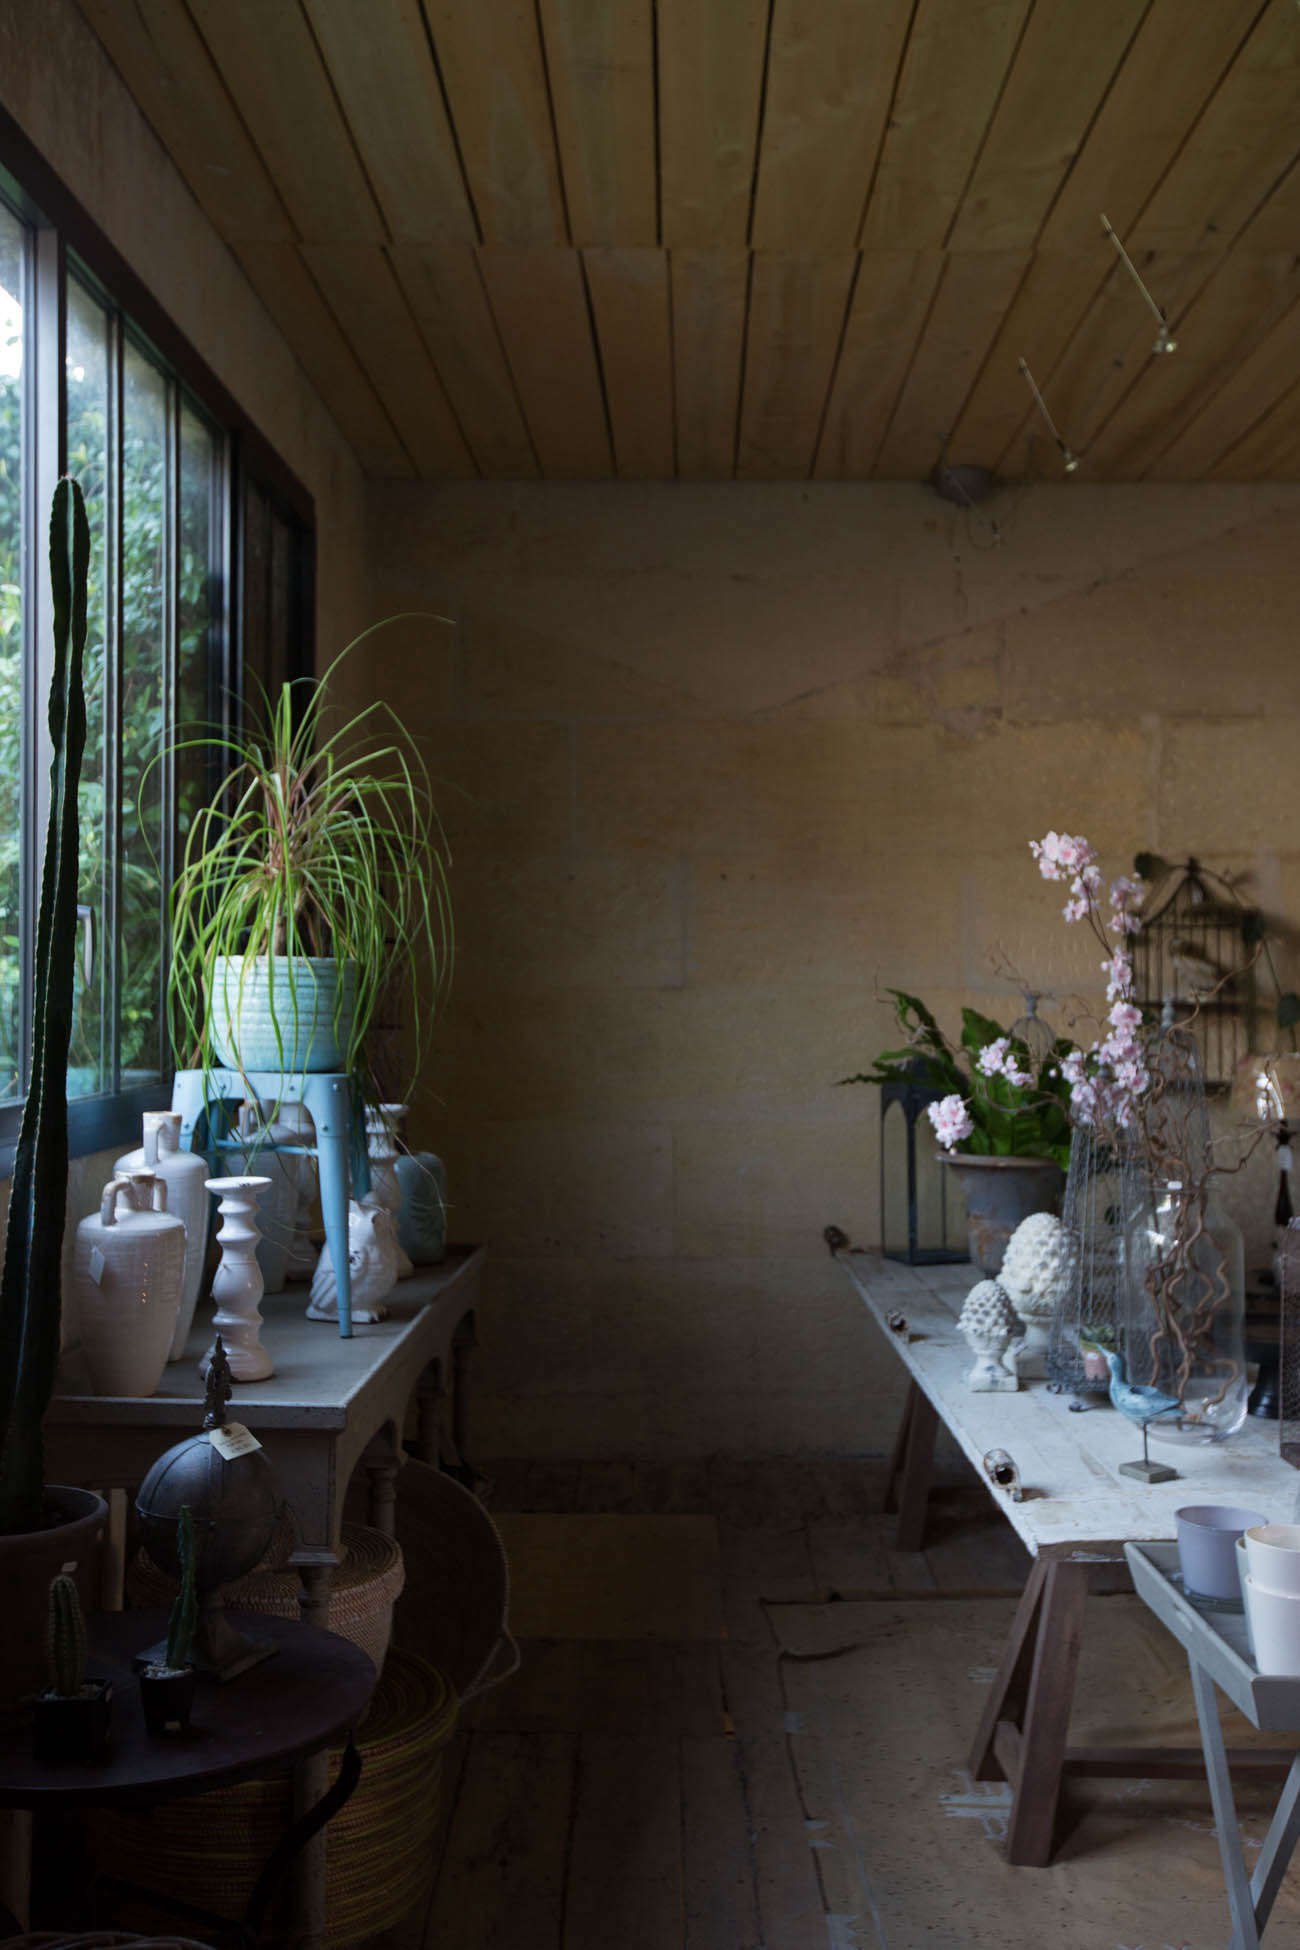 Ambre-store-france-mimi-giboin-gardenista-049